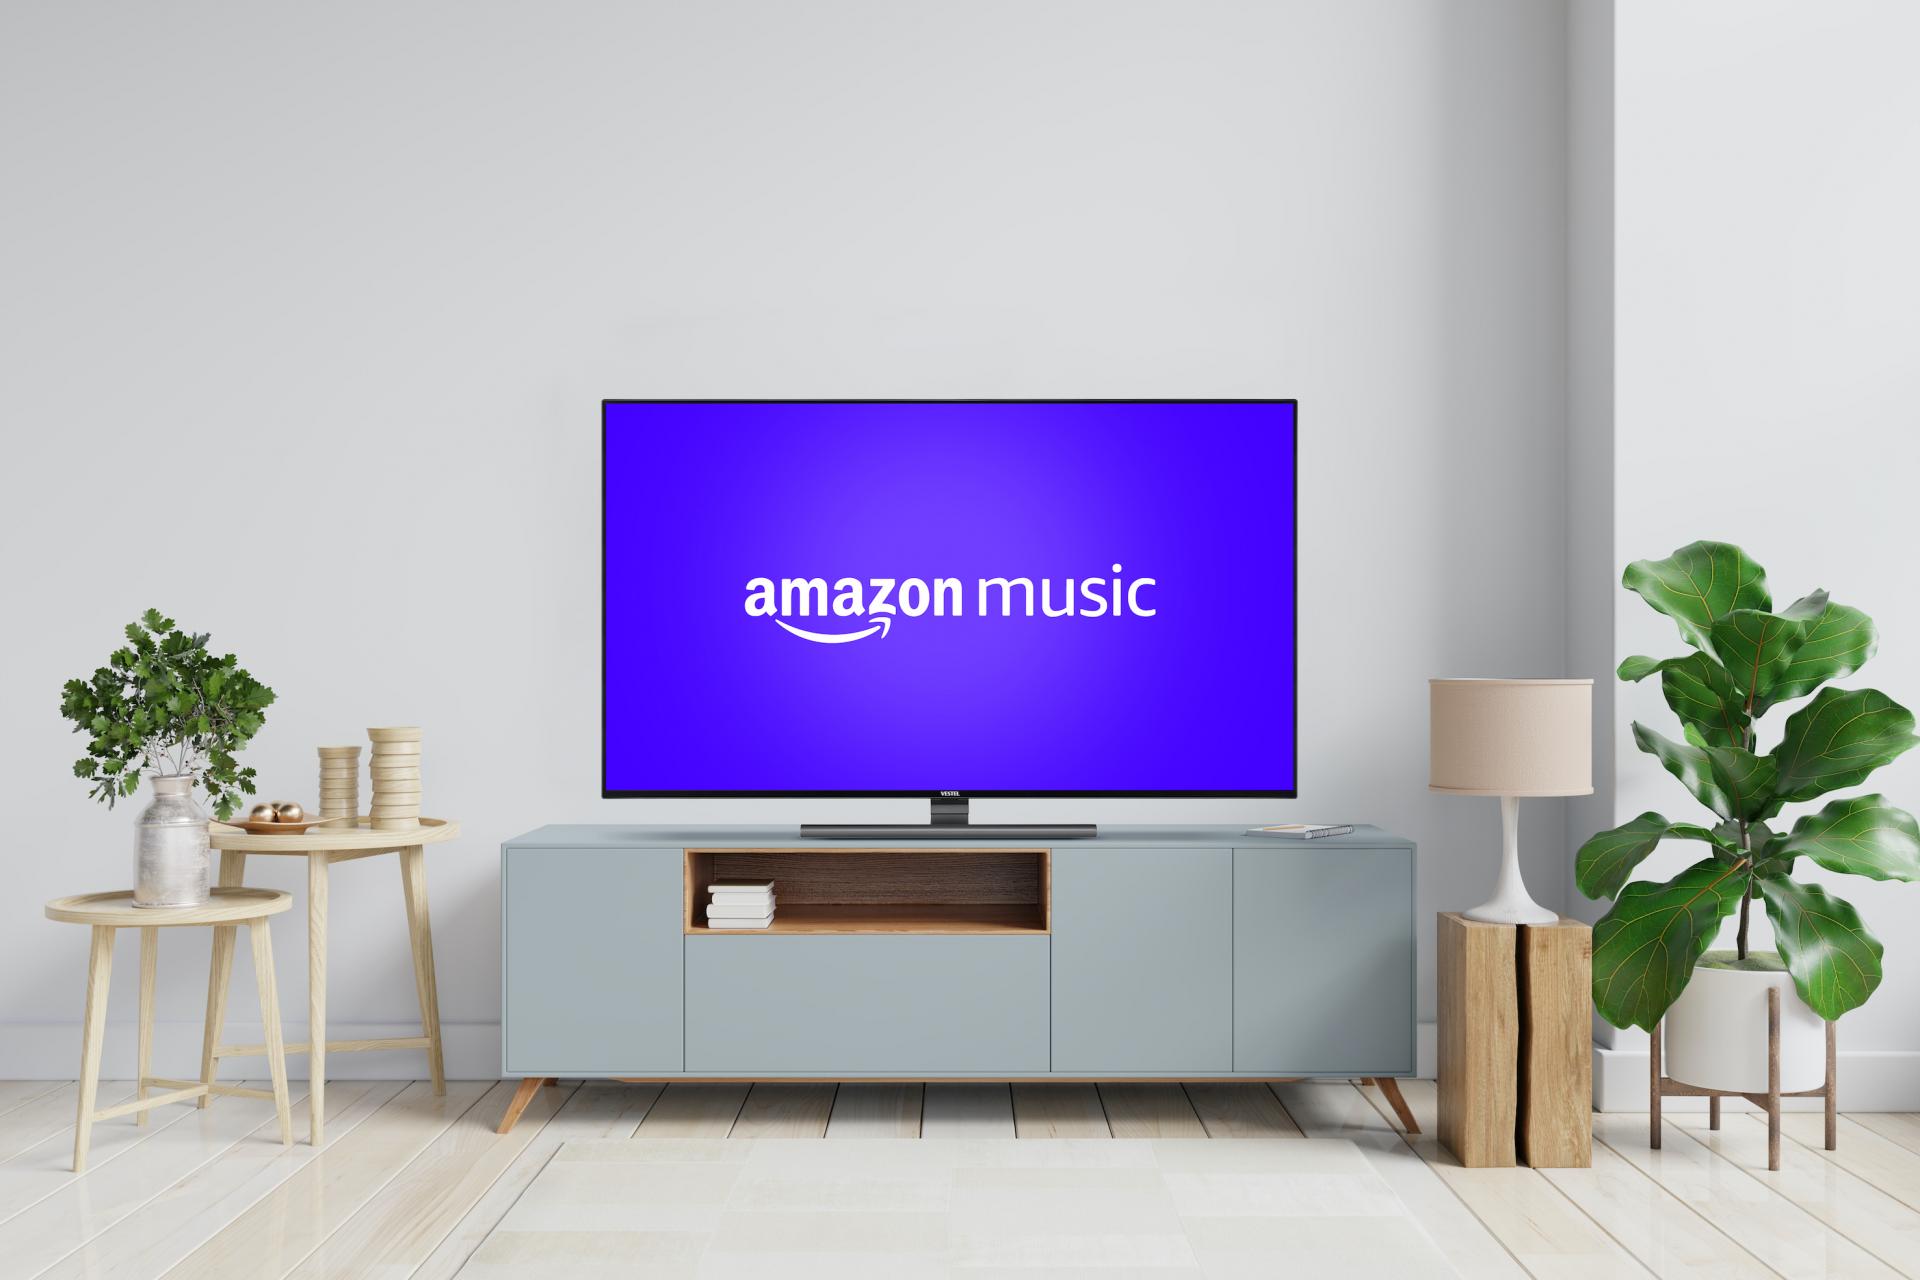 Vestel integriert Amazon Music auf Smart TVs in Europa